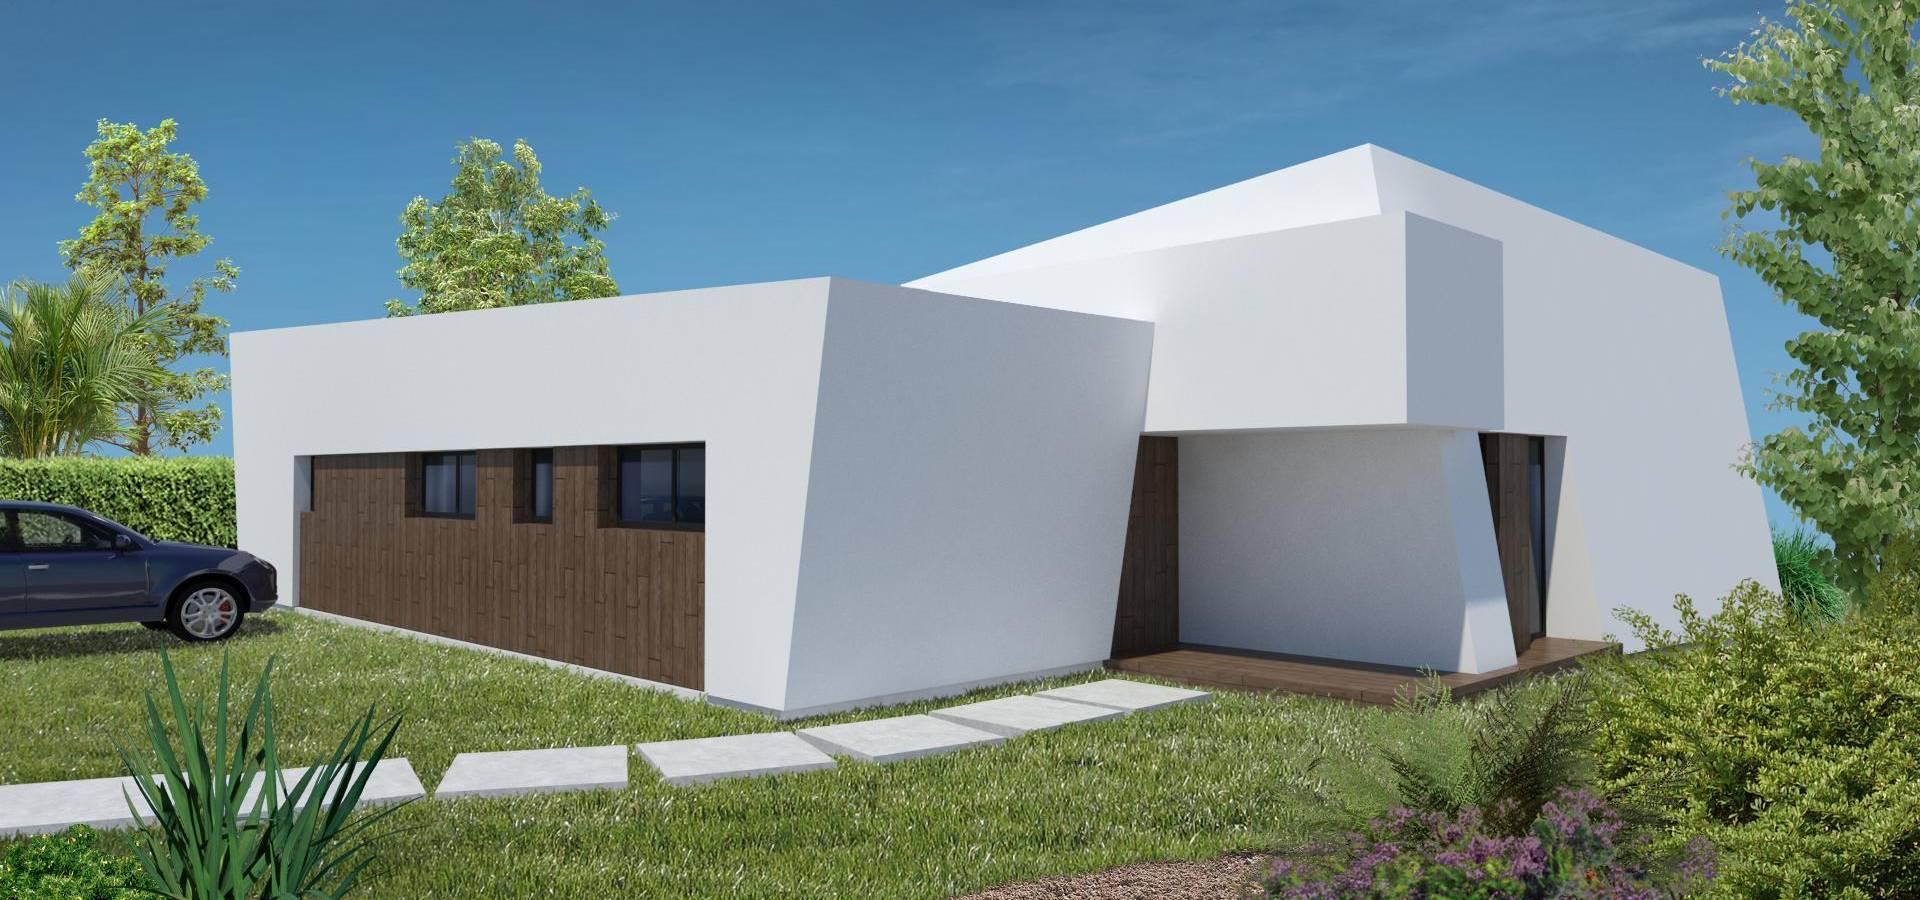 Maison Plus Construcciones Sostenibles